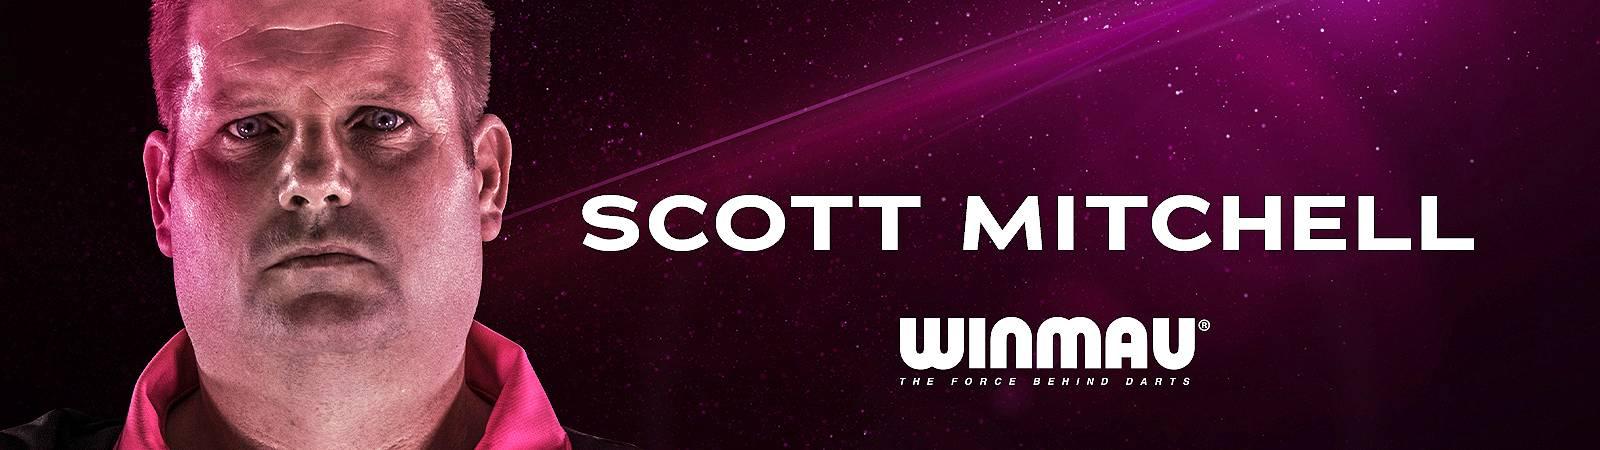 Winmau Scott Mitchell